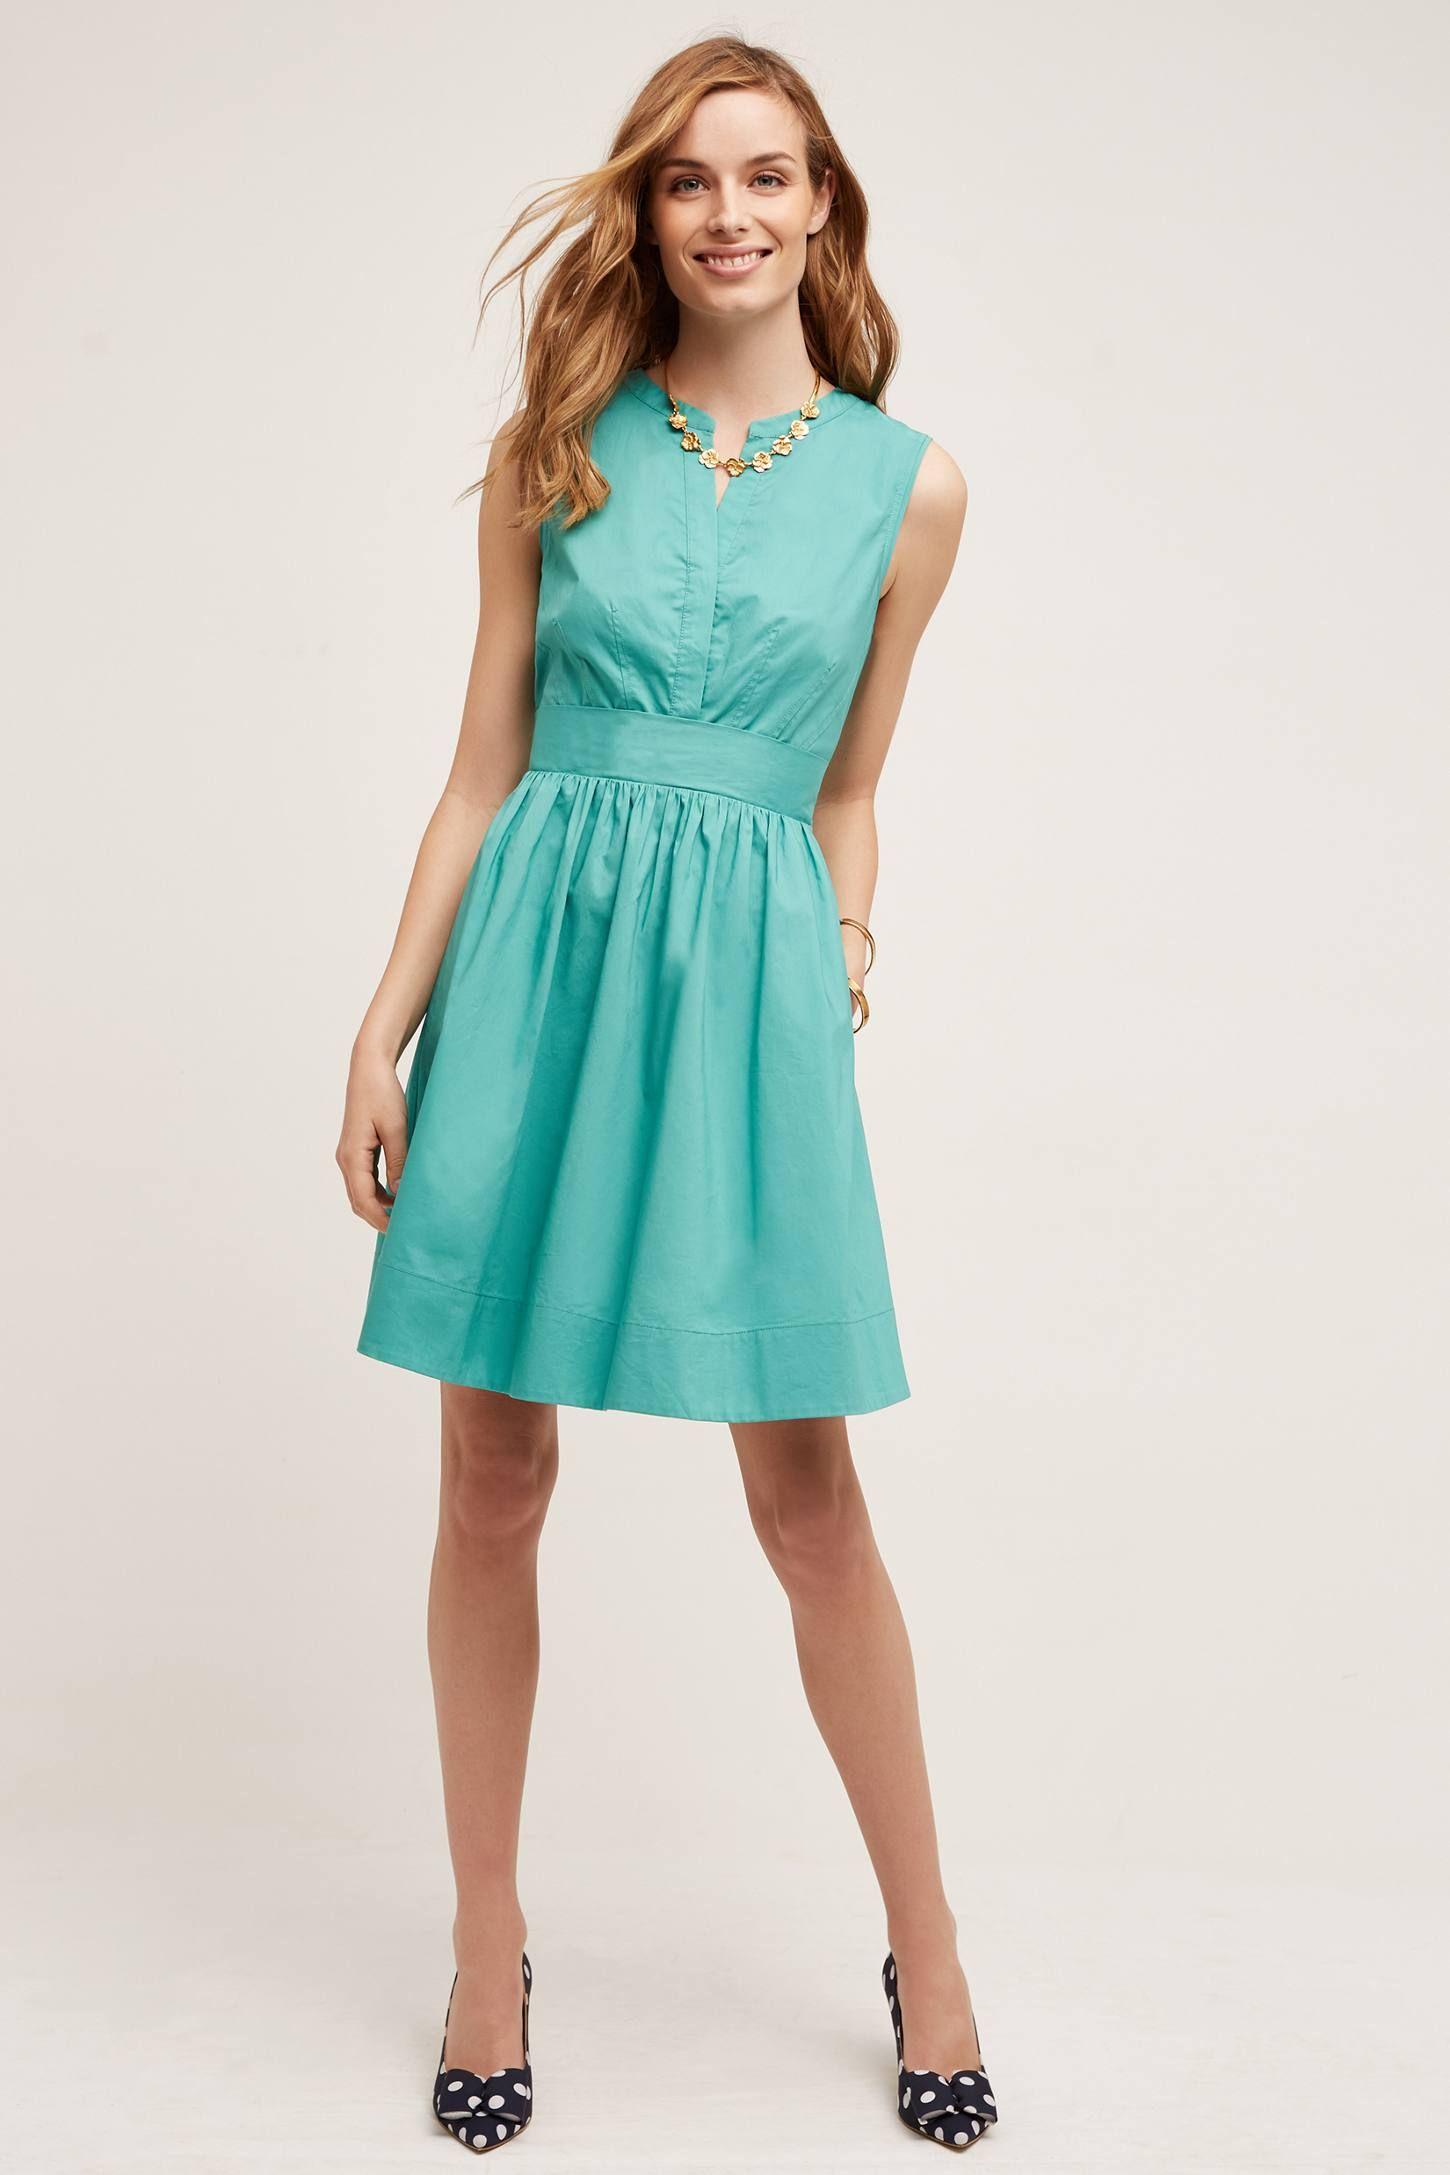 Adrian Shirtdress Dresses Shirts Women Fashion Women S Fashion Dresses [ 2175 x 1450 Pixel ]